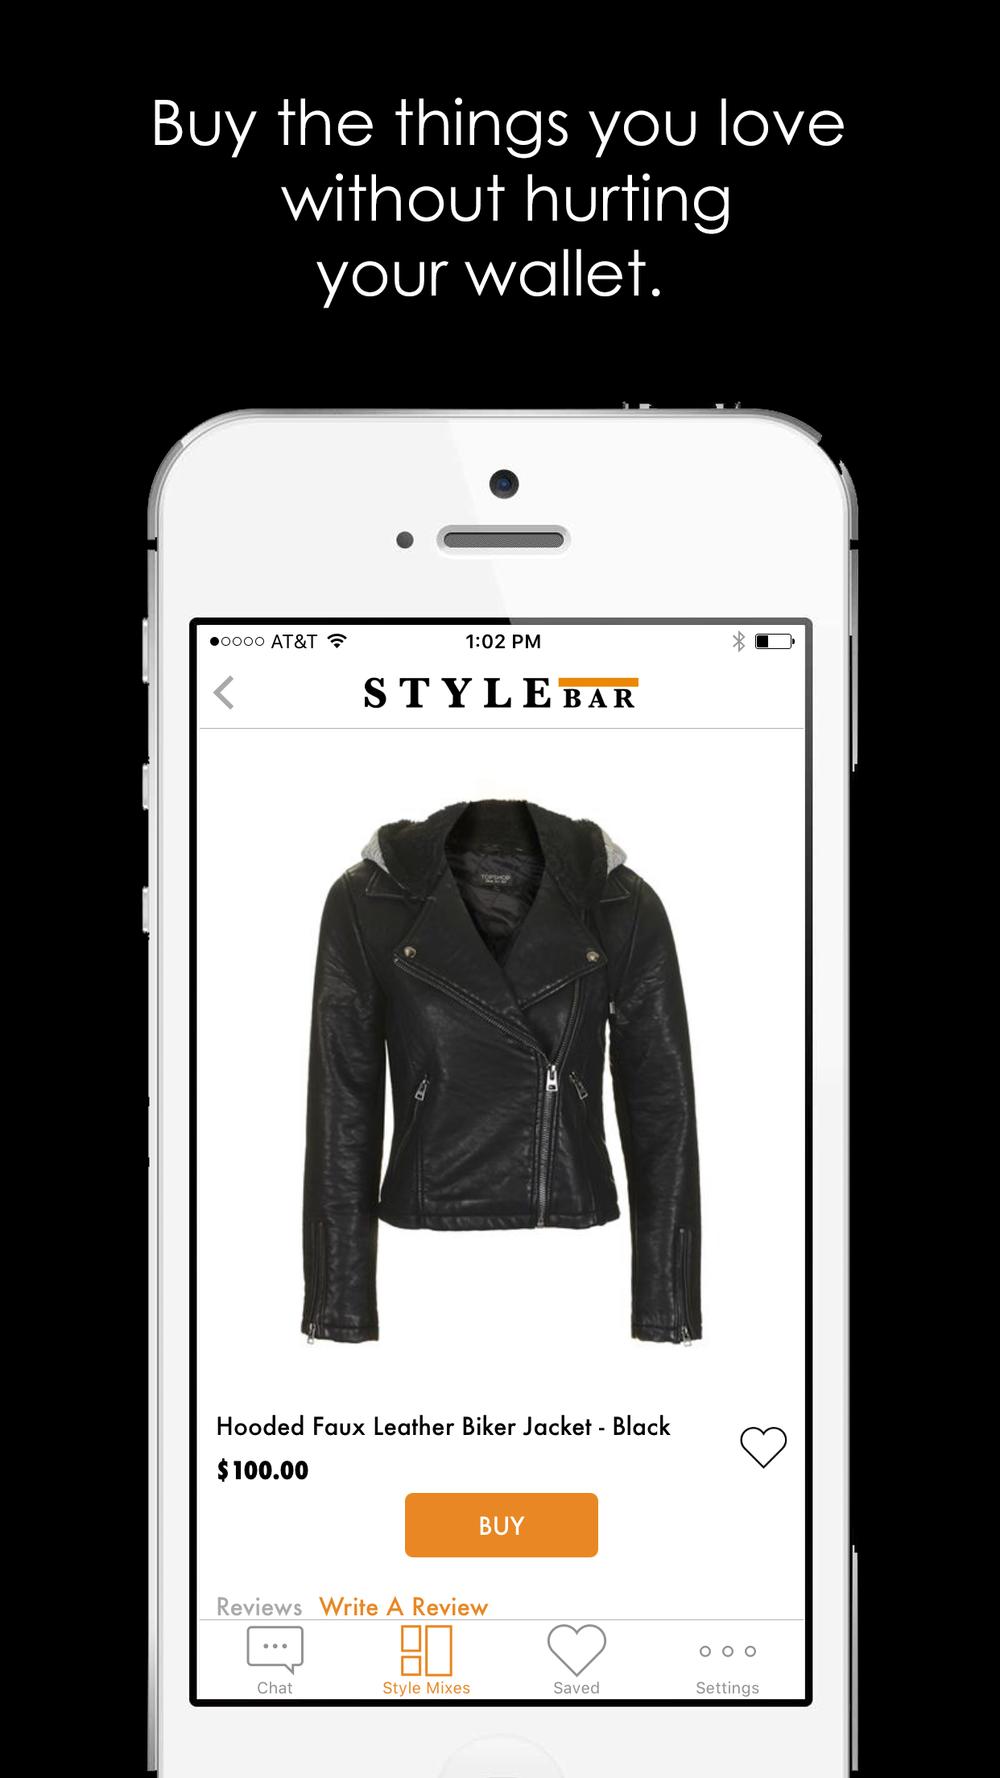 stylebar, nicole ruccolo, style bar, style, fashion apps